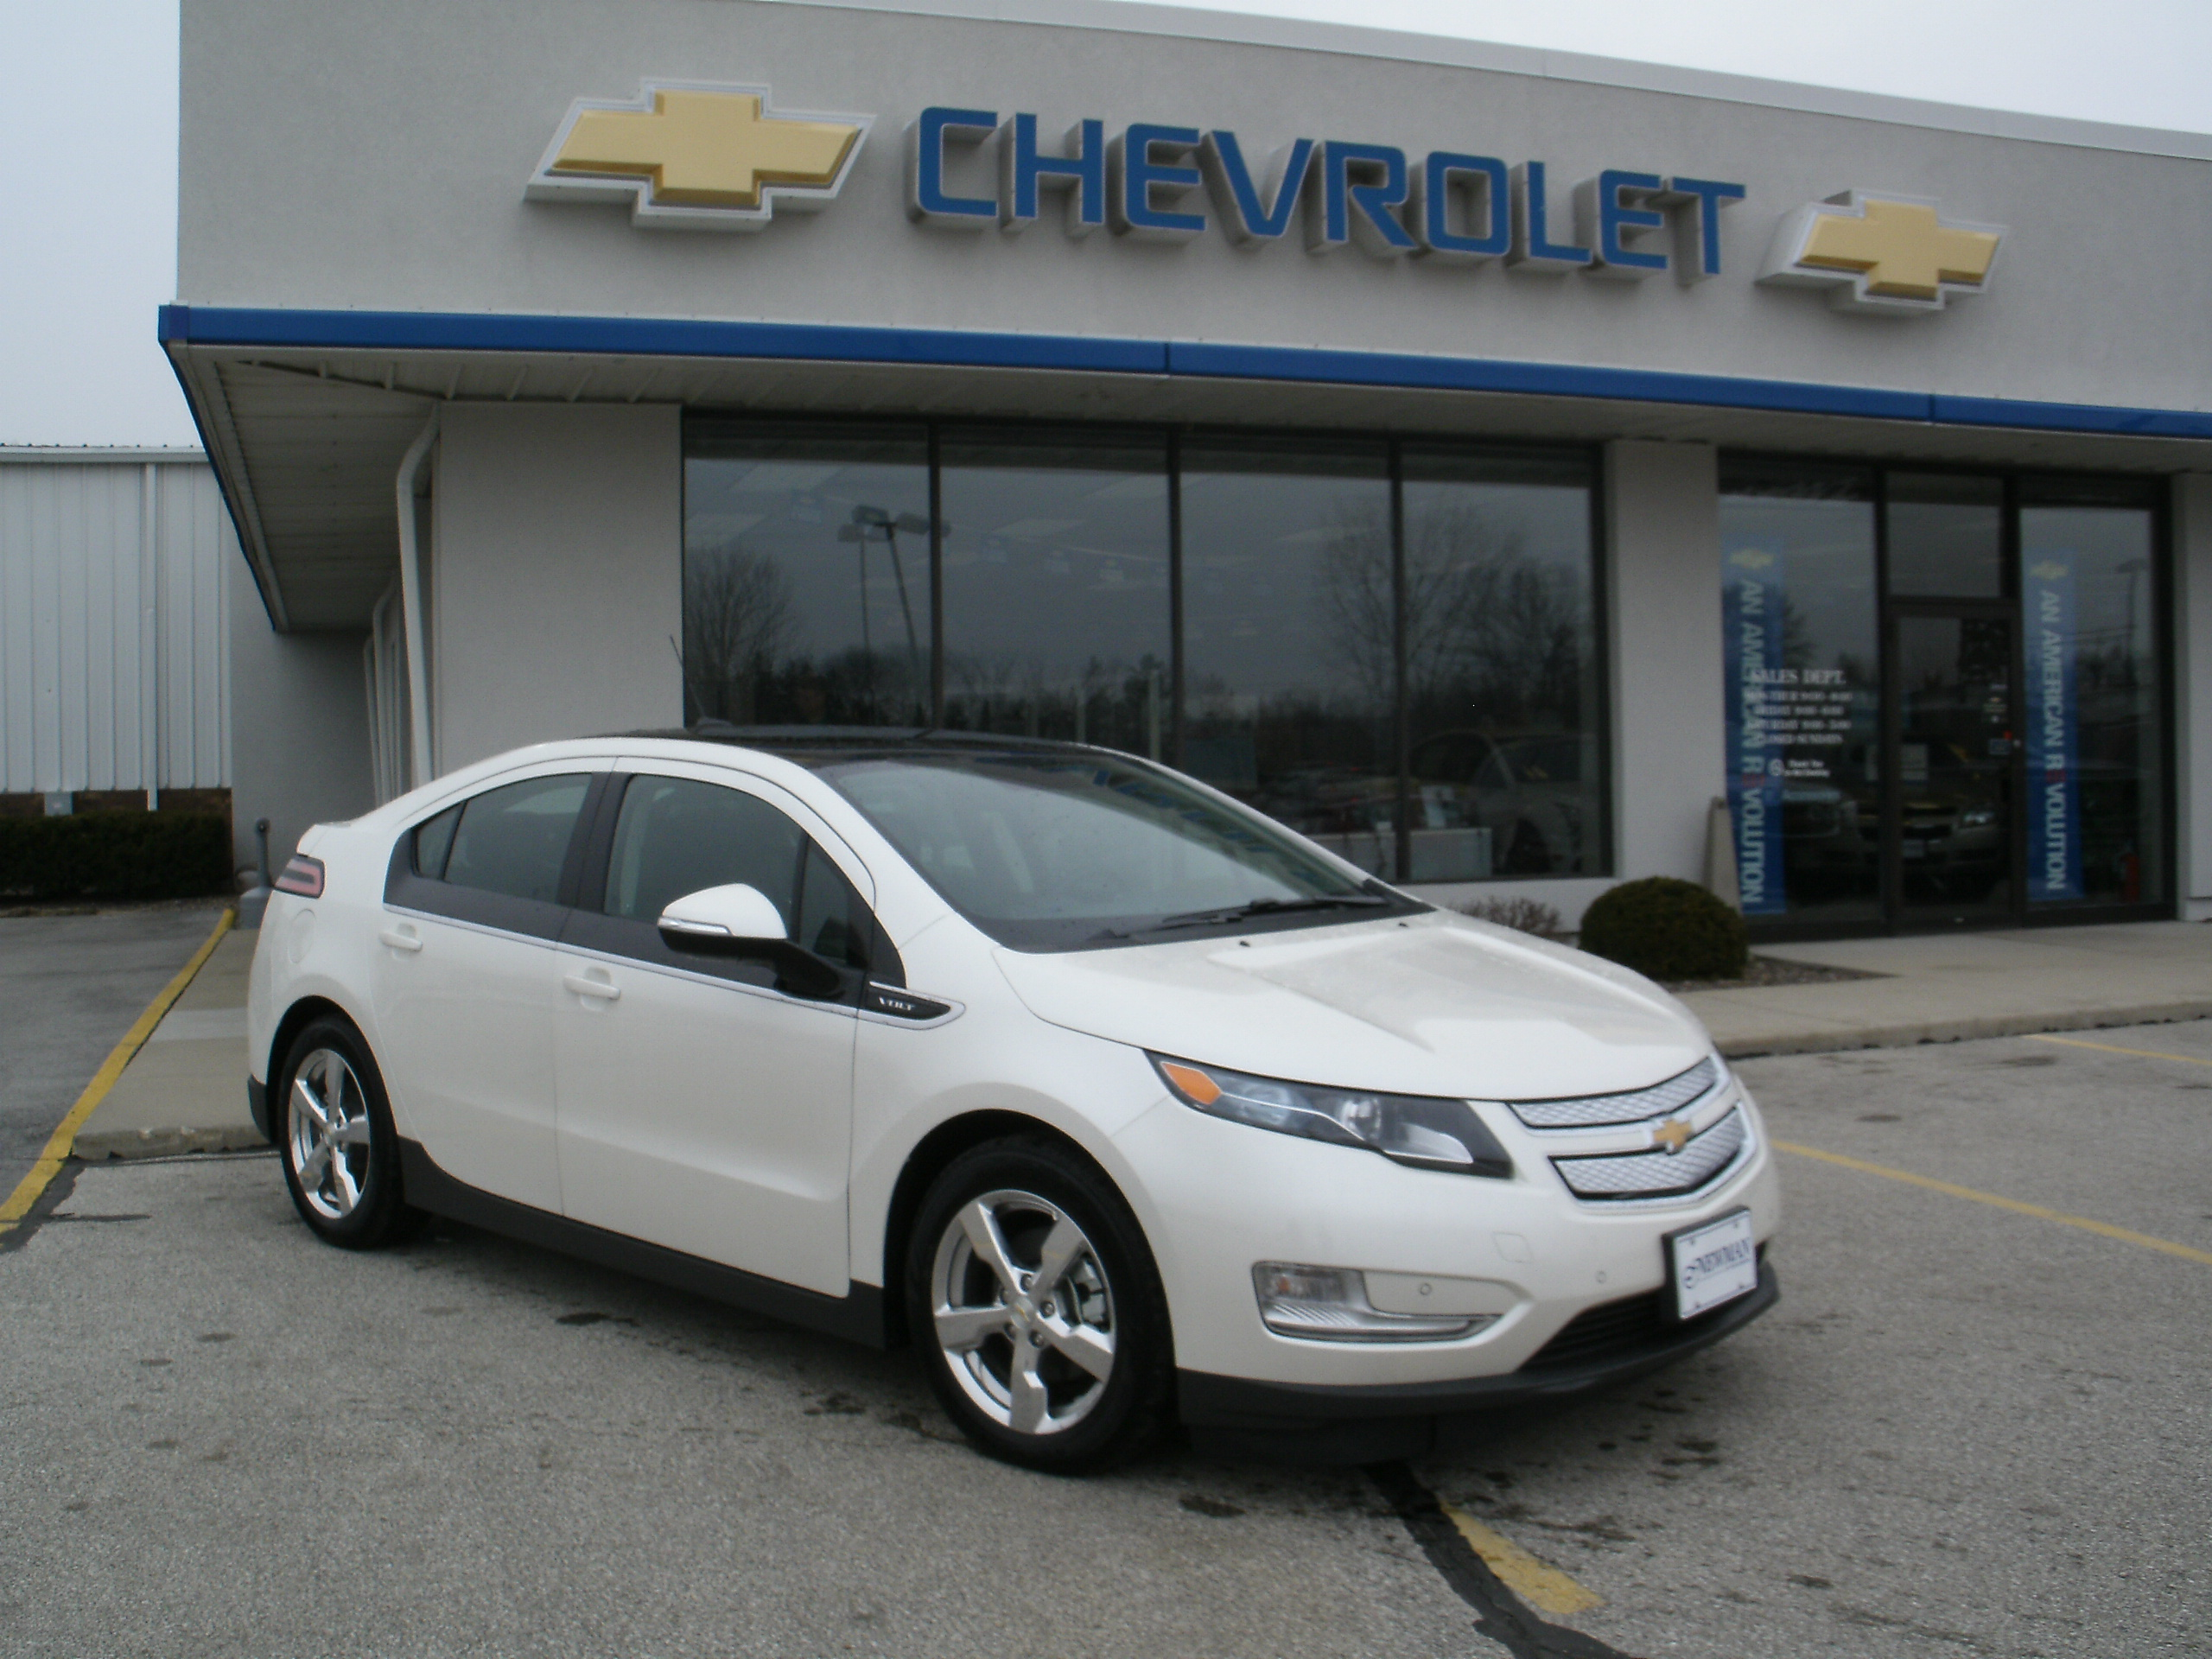 2012 Chevrolet Volt Image 9